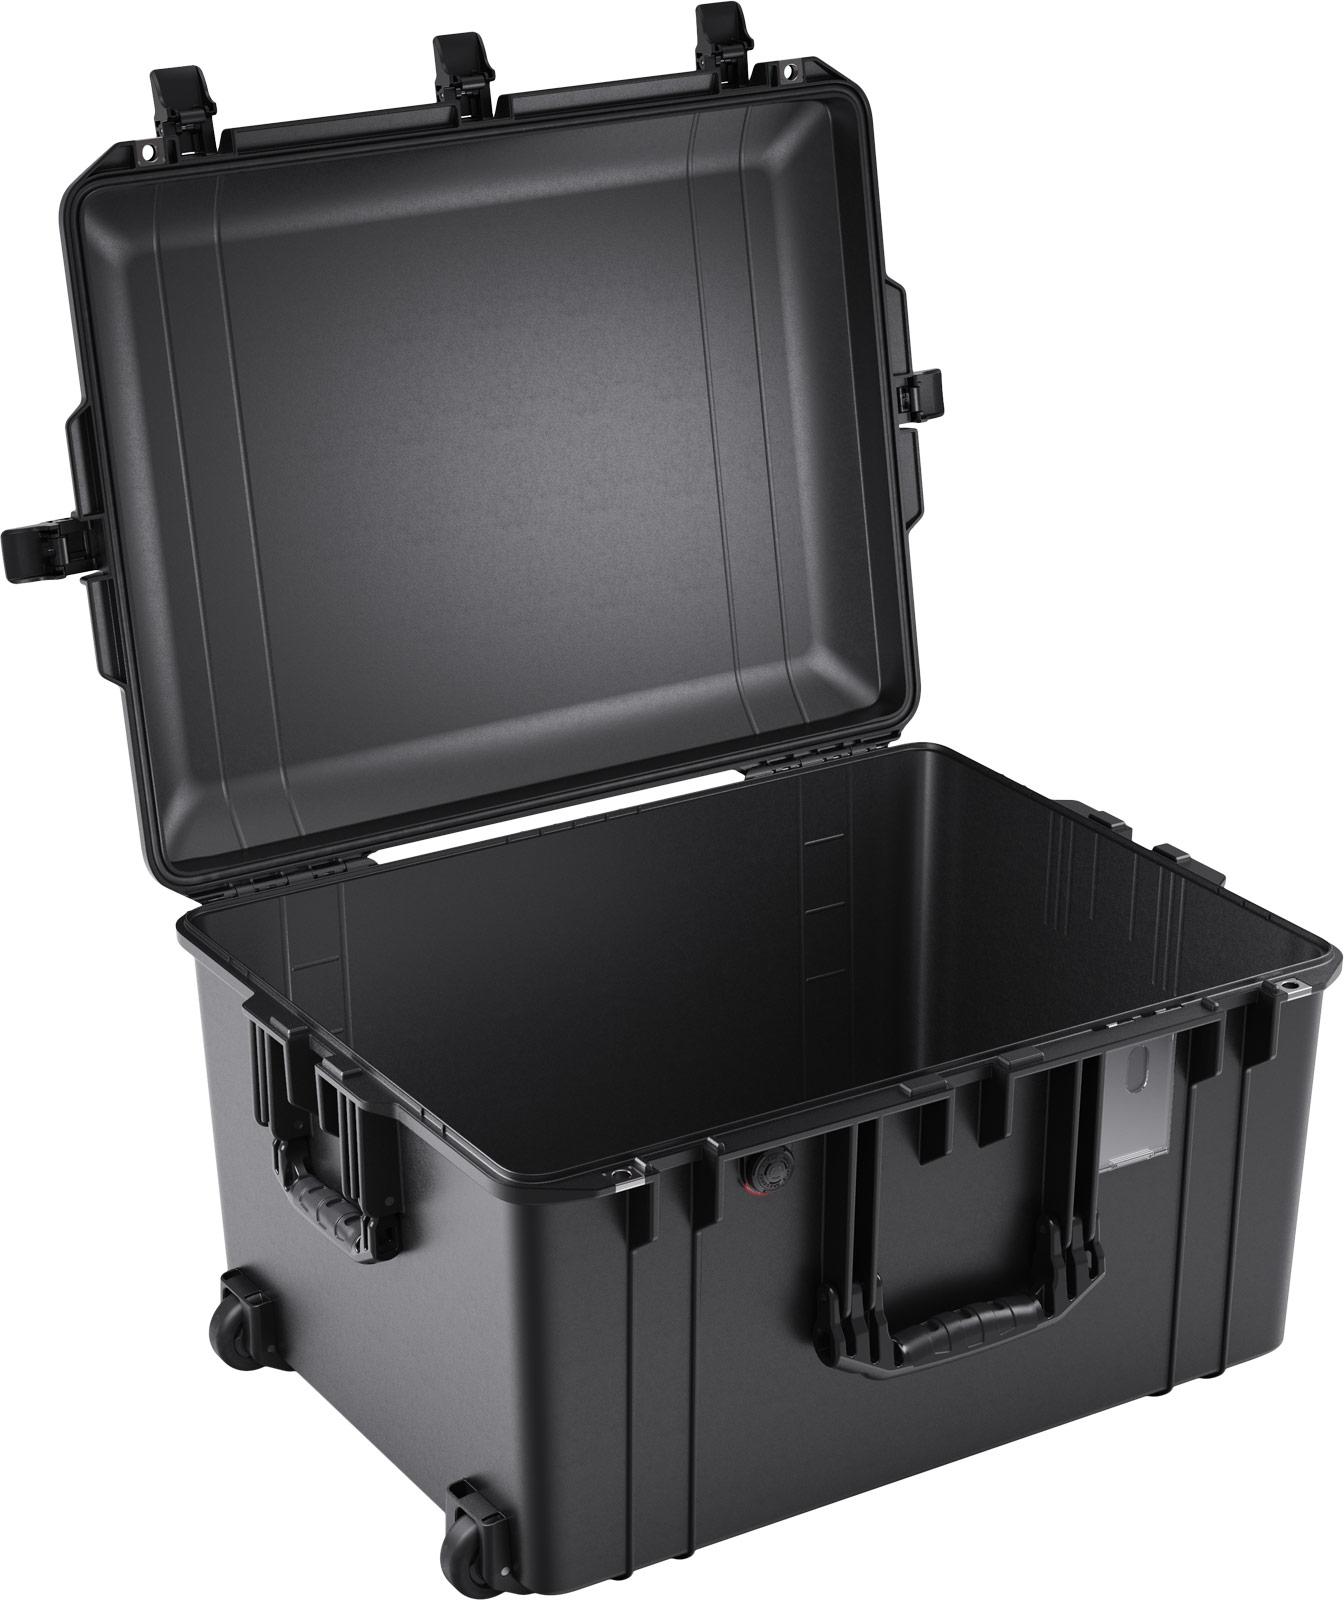 pelican 1637nf air case deep travel cases